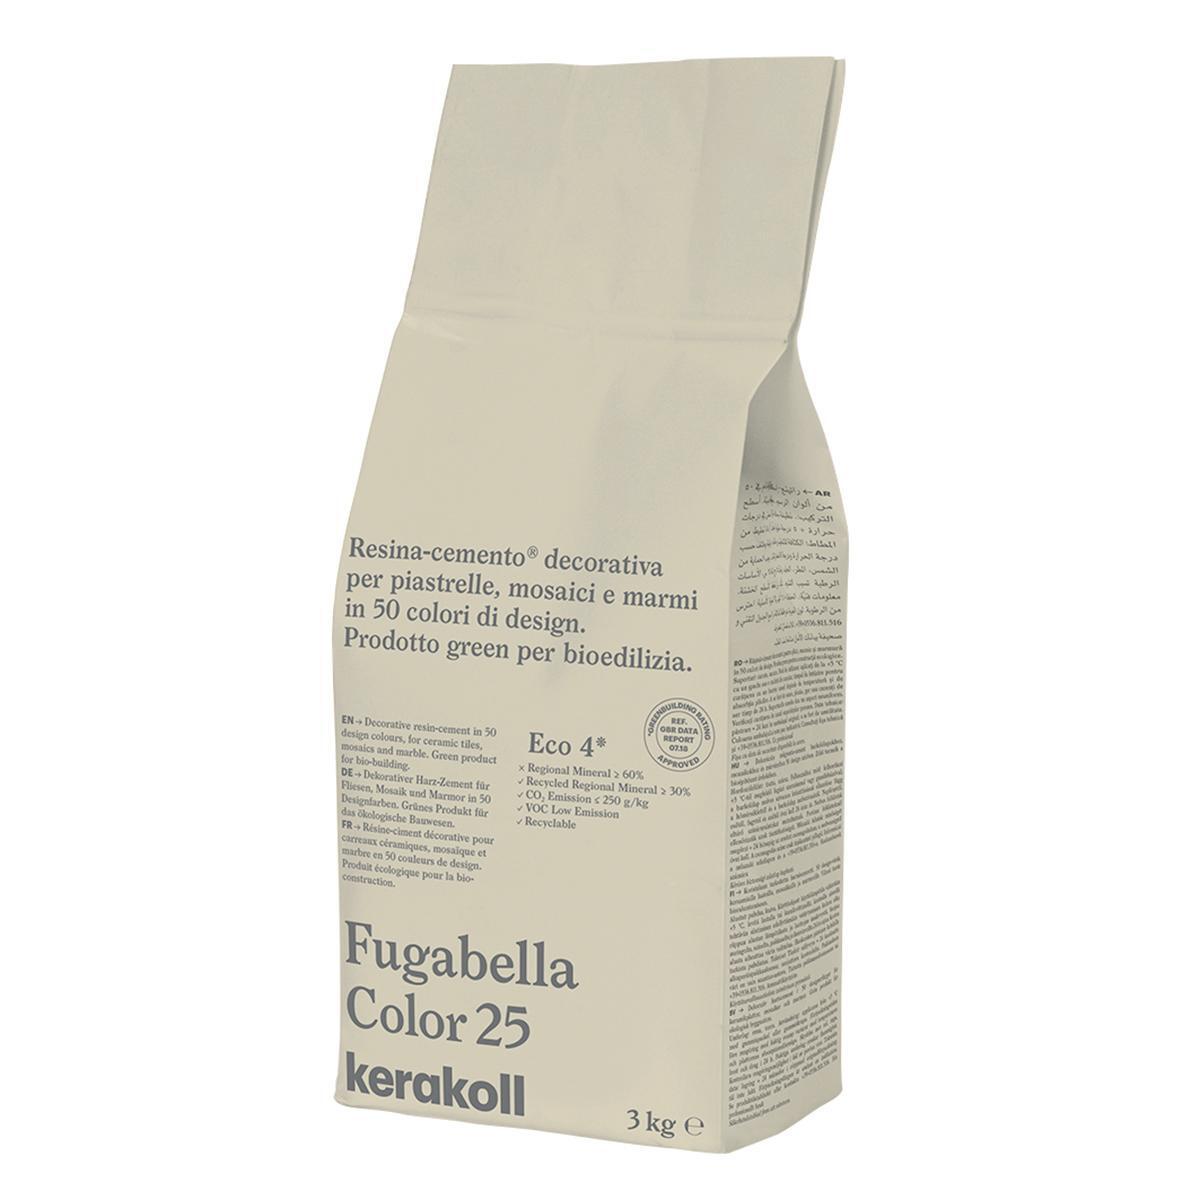 Stucco in polvere FUGABELLA COLOR KERAKOLL 3 kg tortora - 2